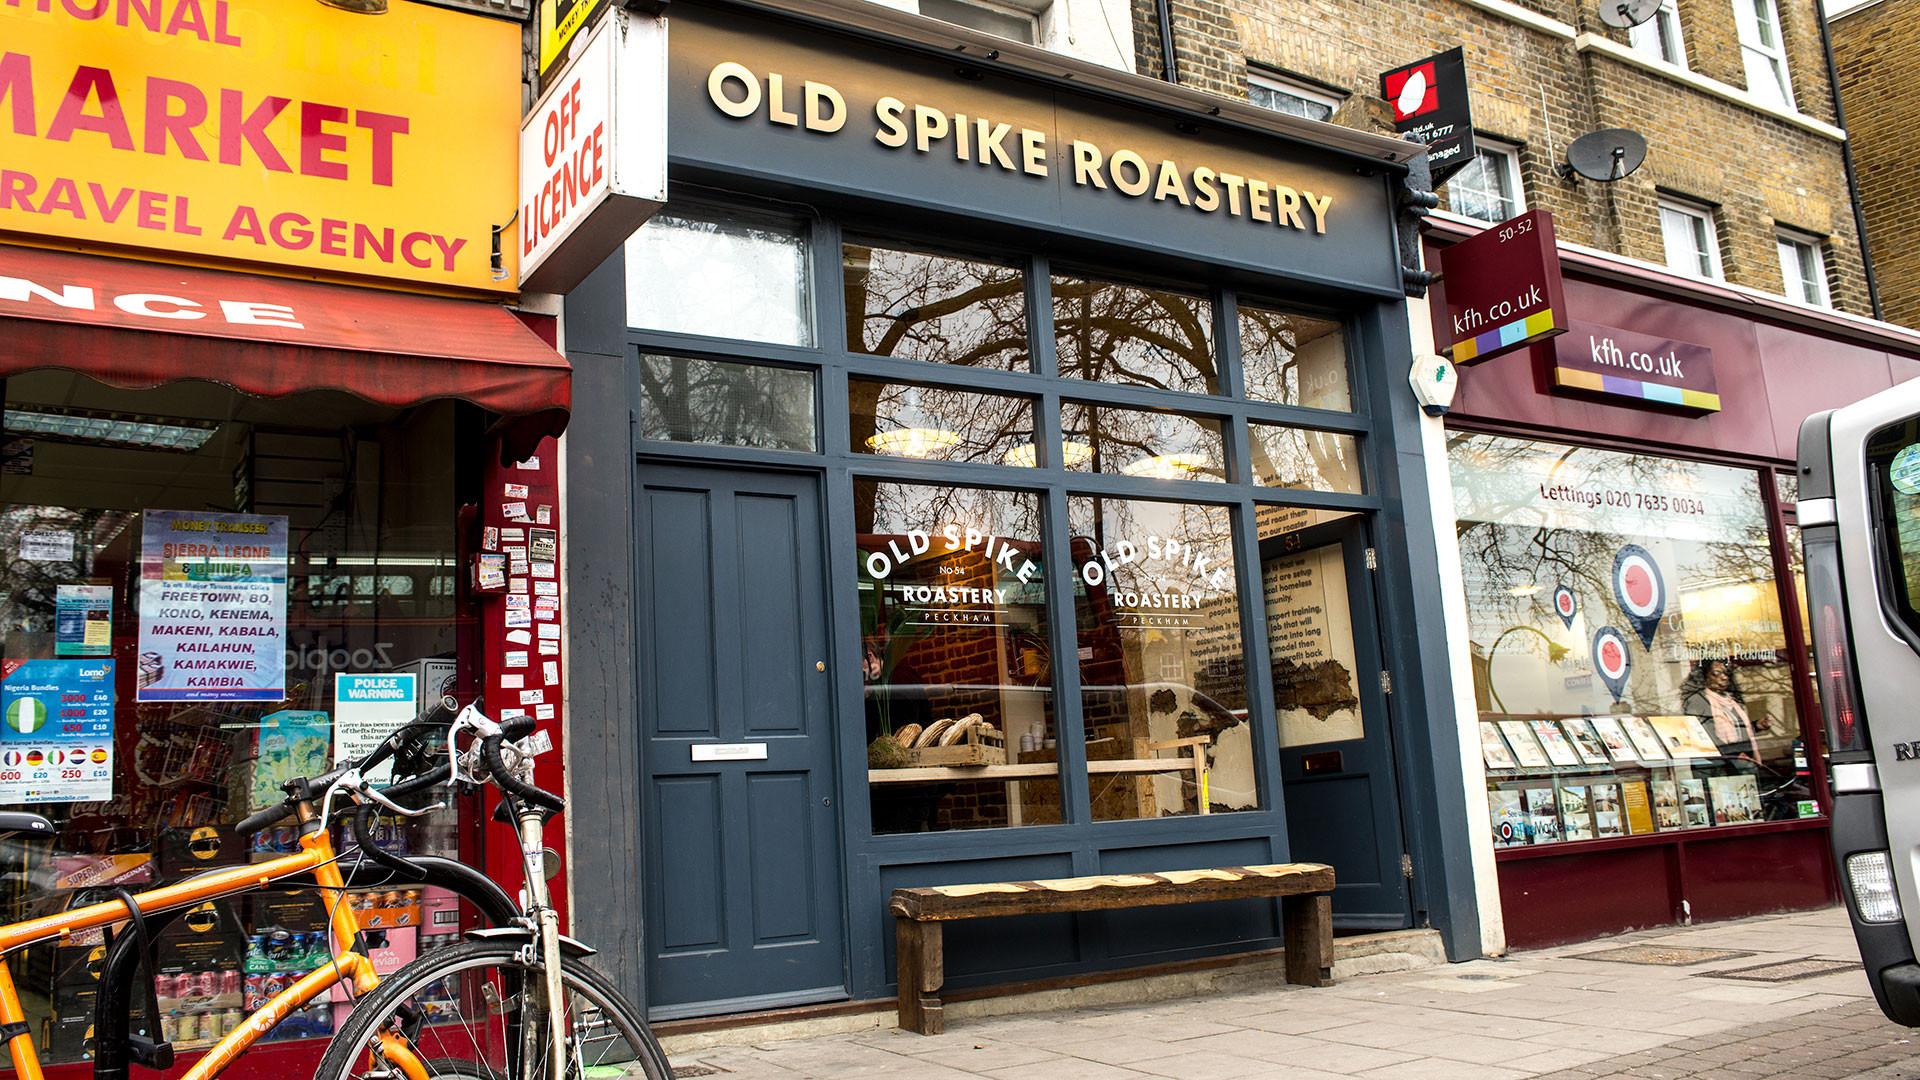 Old Spike Roastery